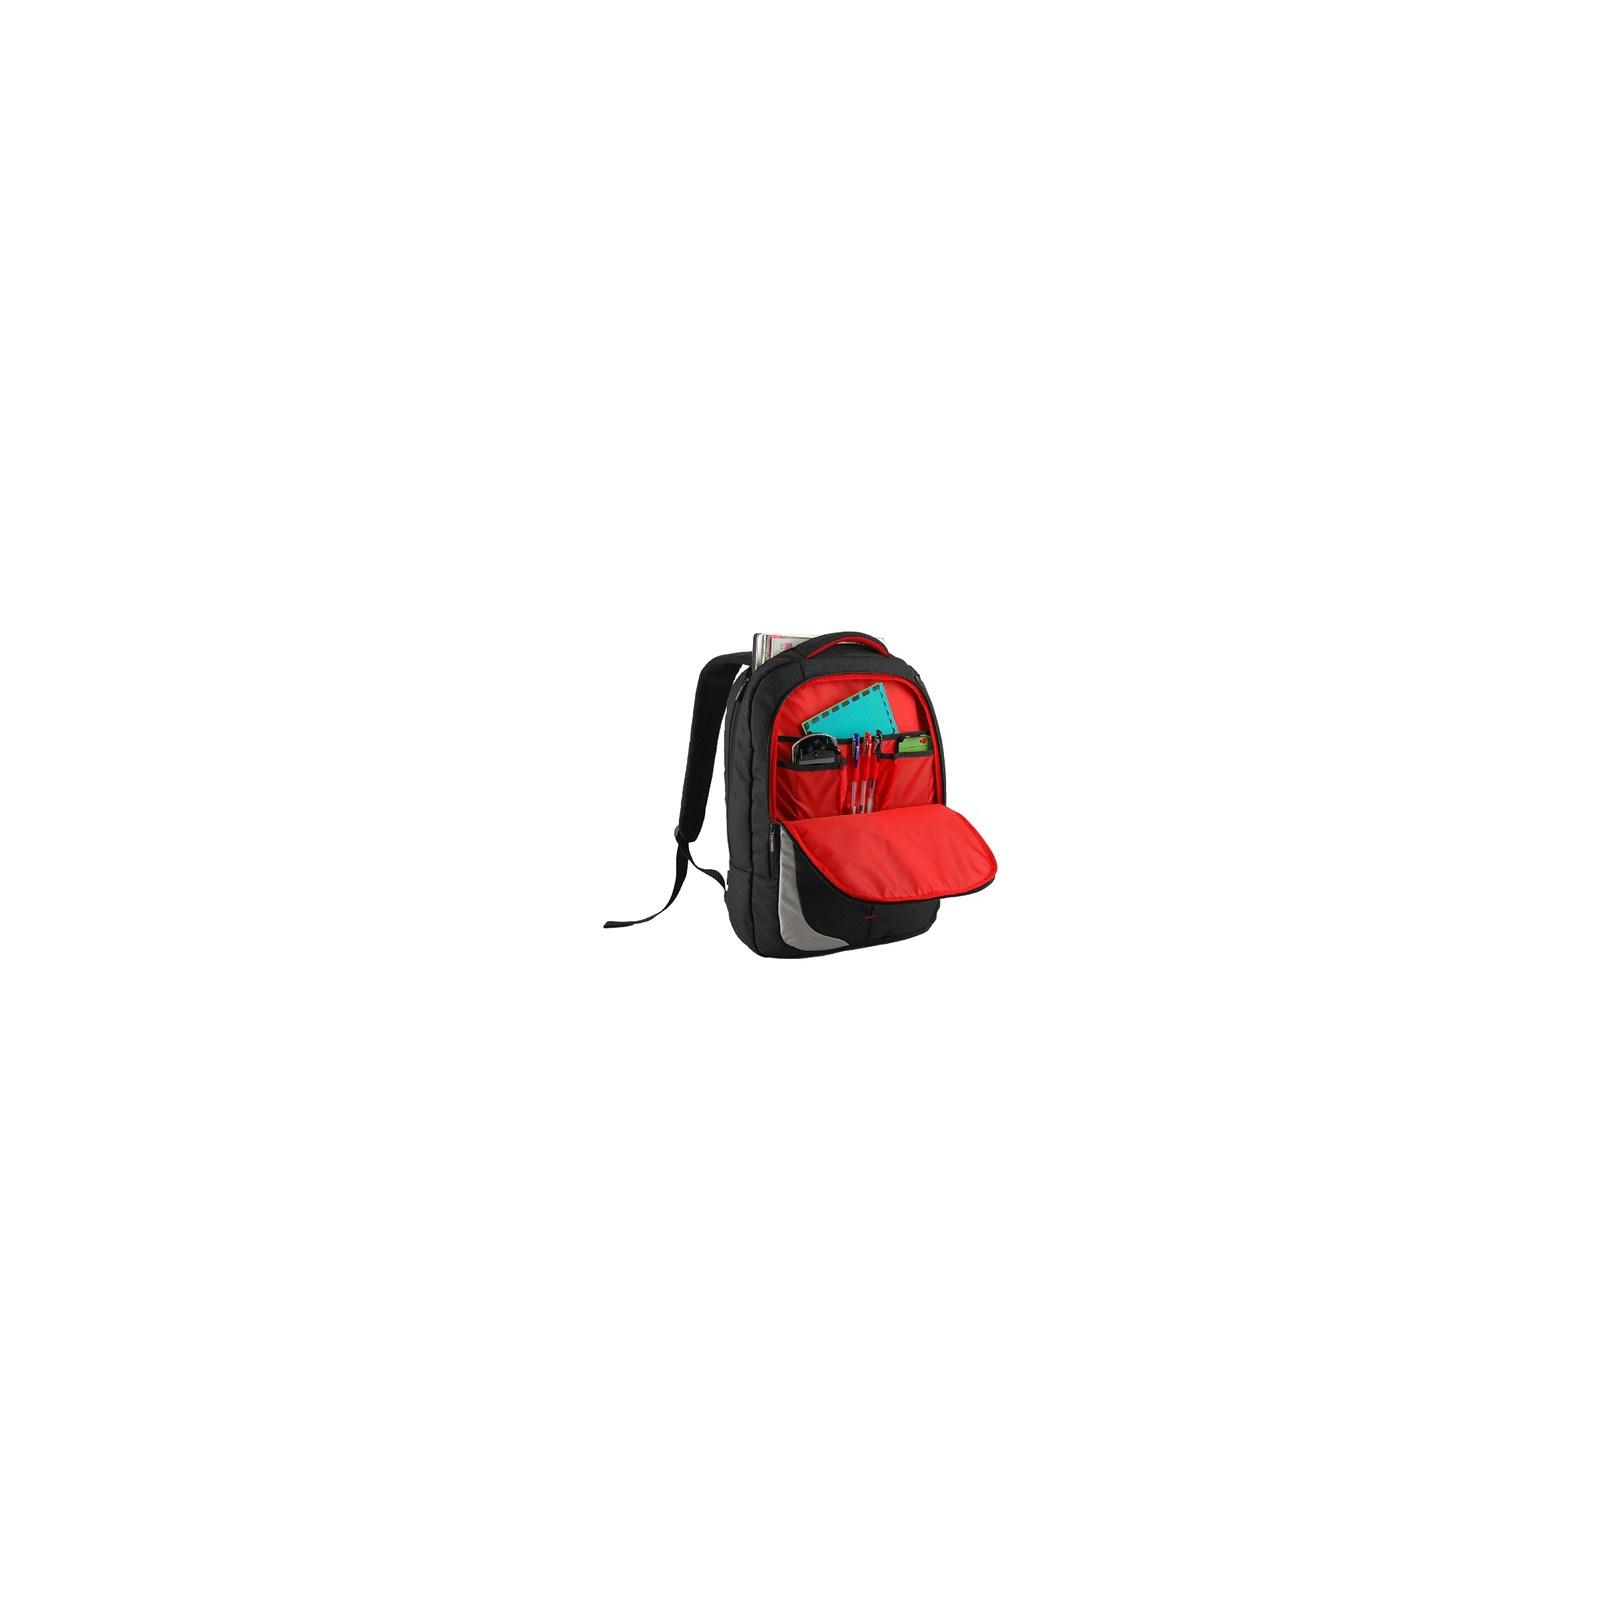 Рюкзак для ноутбука Crown 15.6 Genuine black (BPG4415B) изображение 2